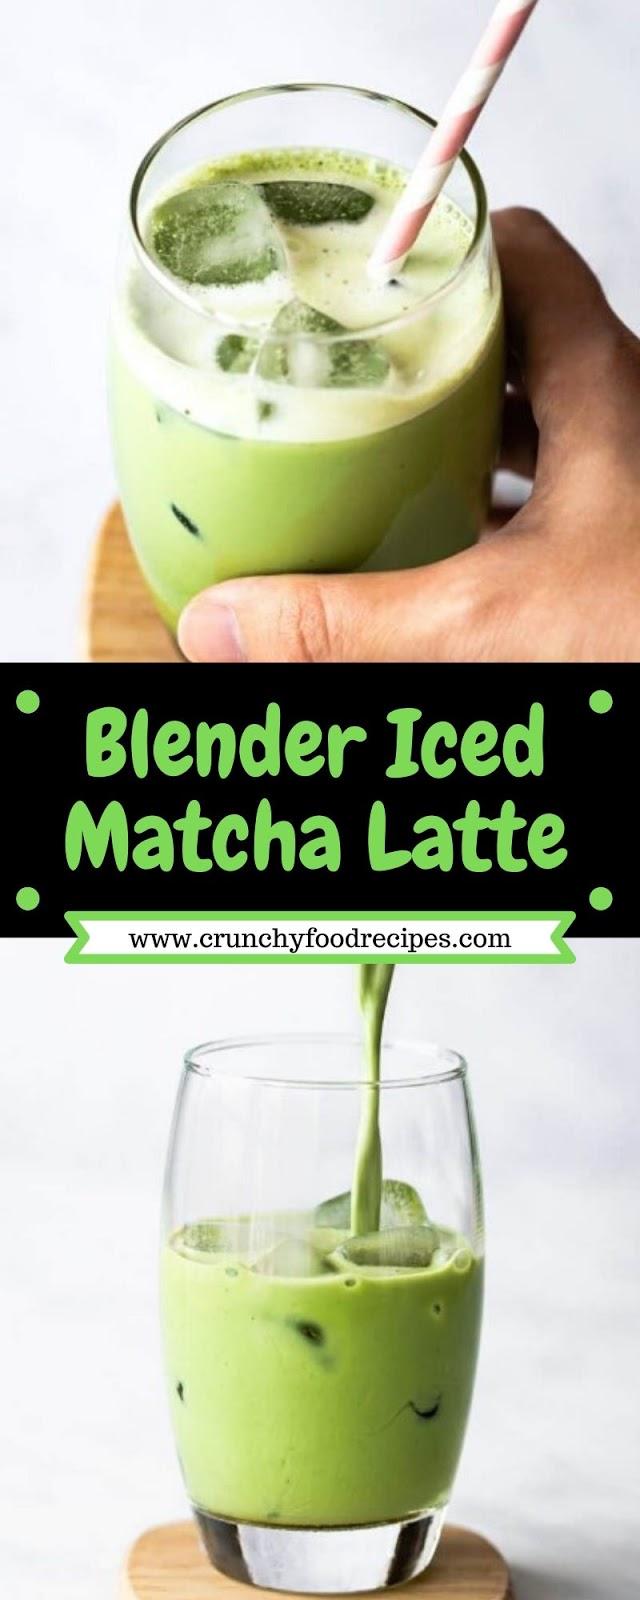 Blender Iced Matcha Latte